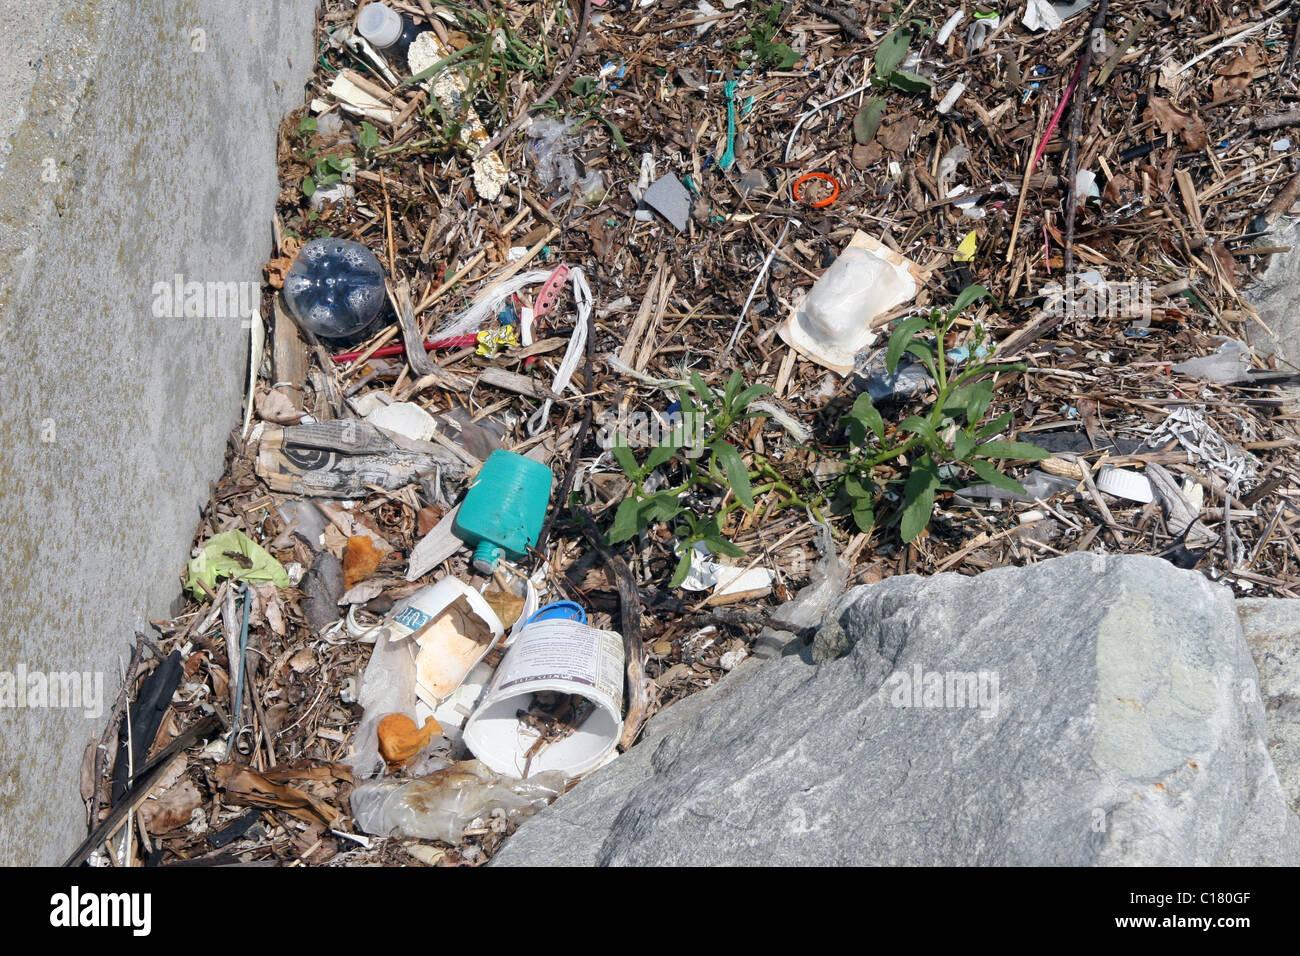 Ocean litter and beach wrack, near Newport, Rhode Island, New England, USA. - Stock Image